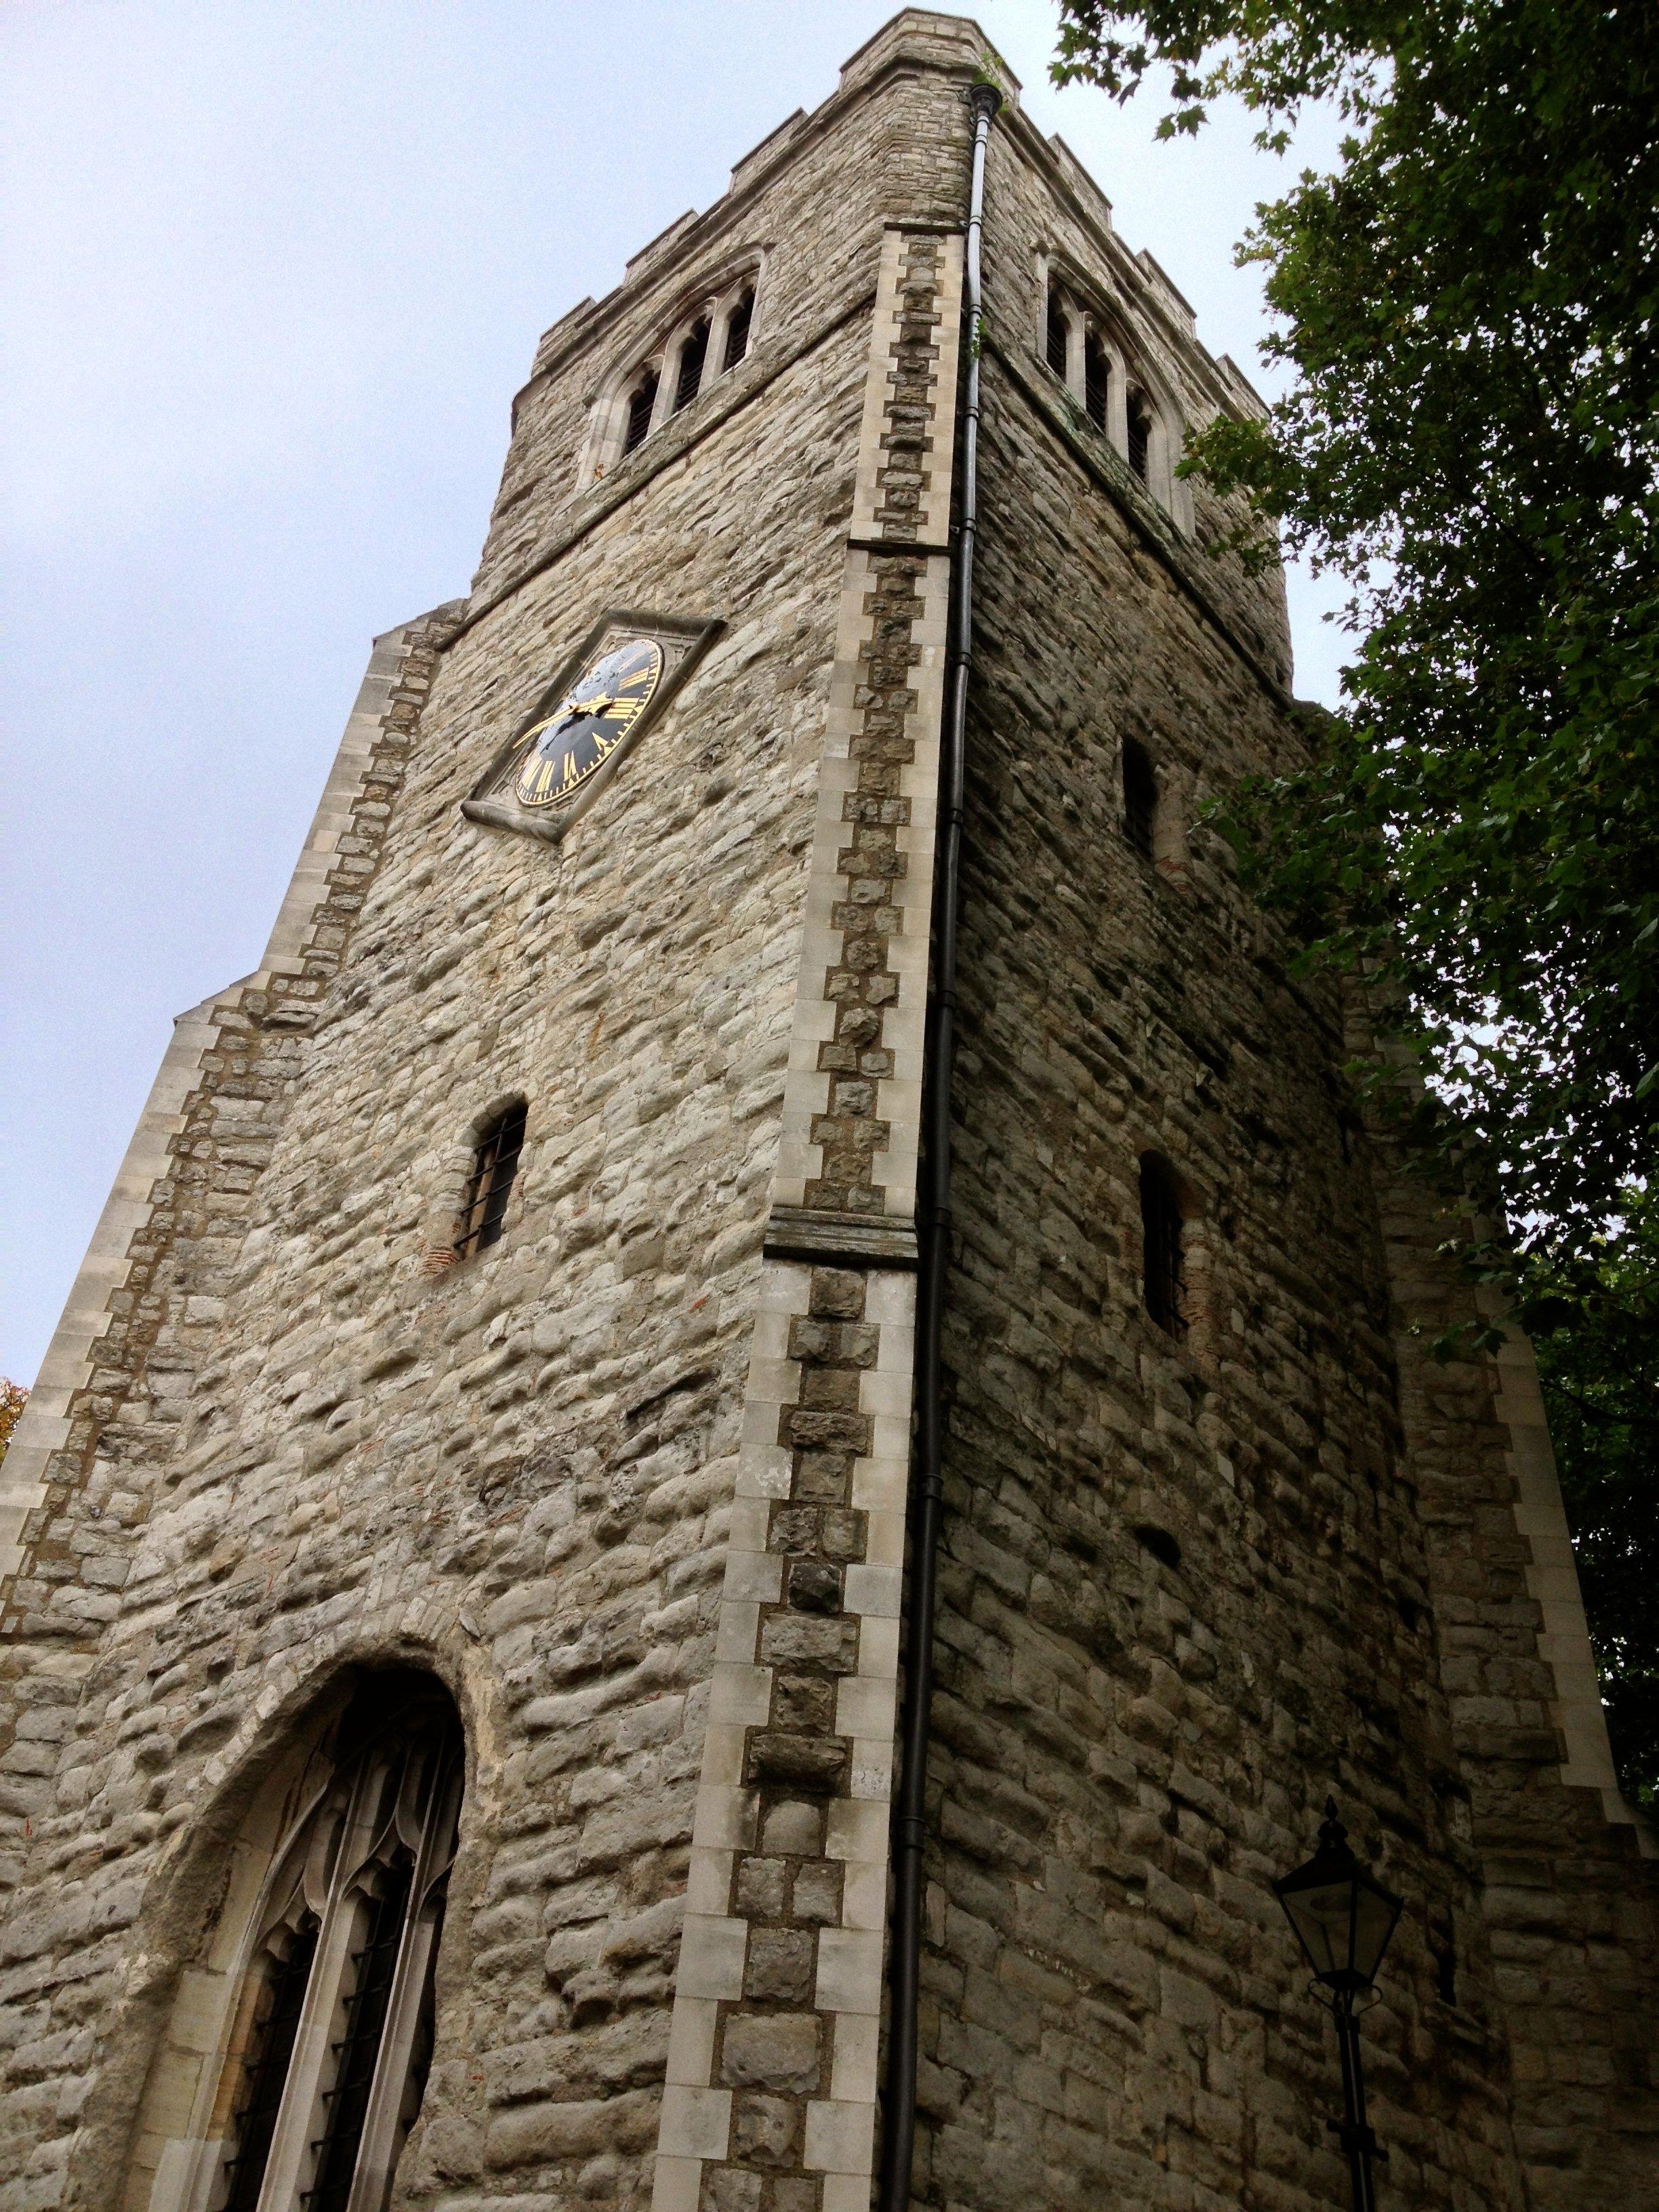 St. Augustine's Tower – Hackney, London